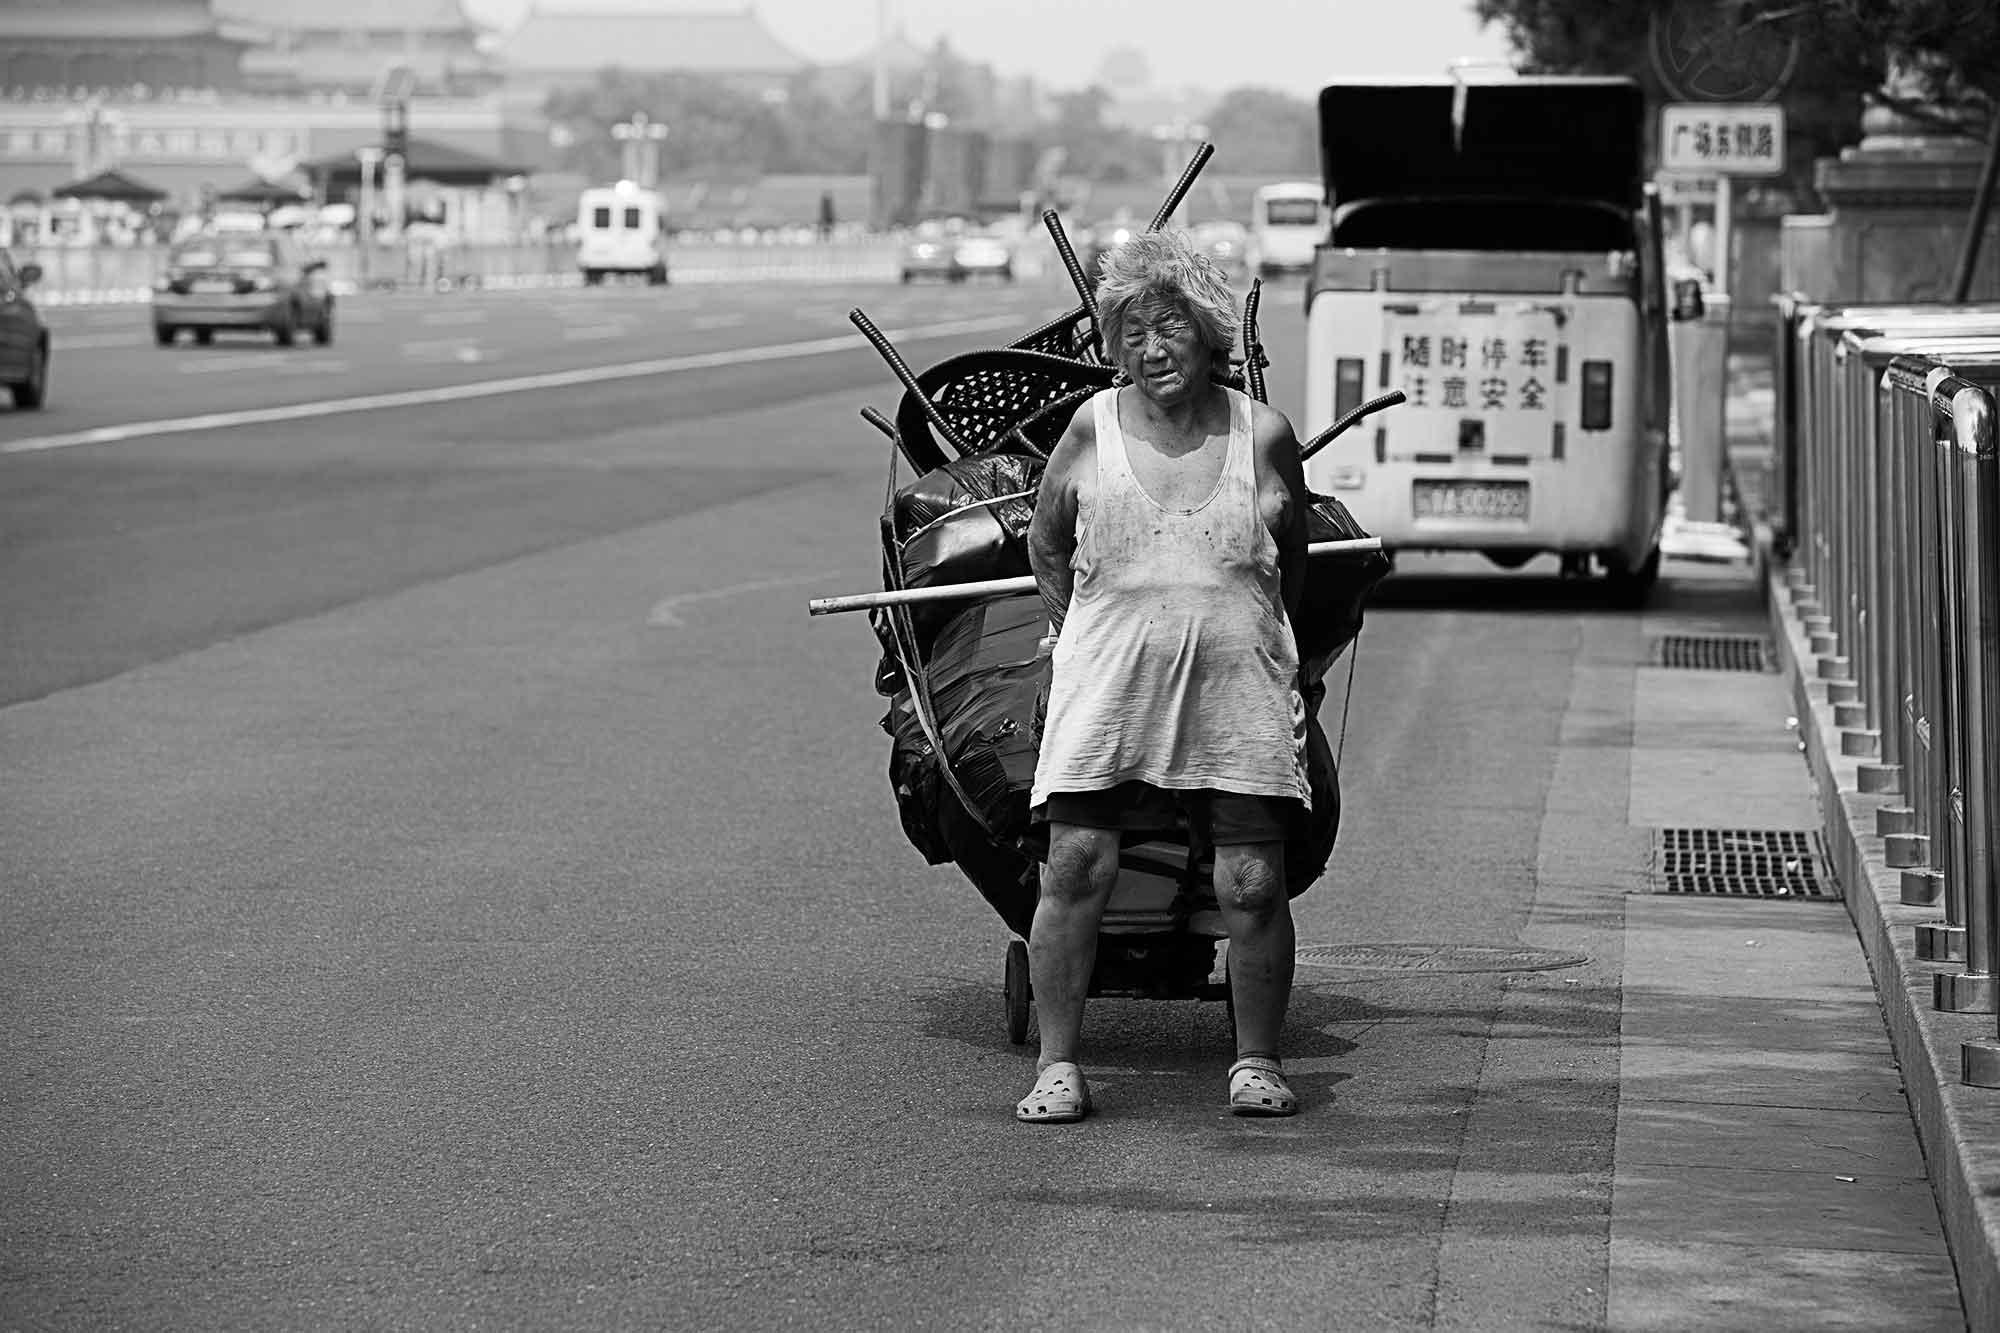 © ULLI MAIER & NISA MAIER